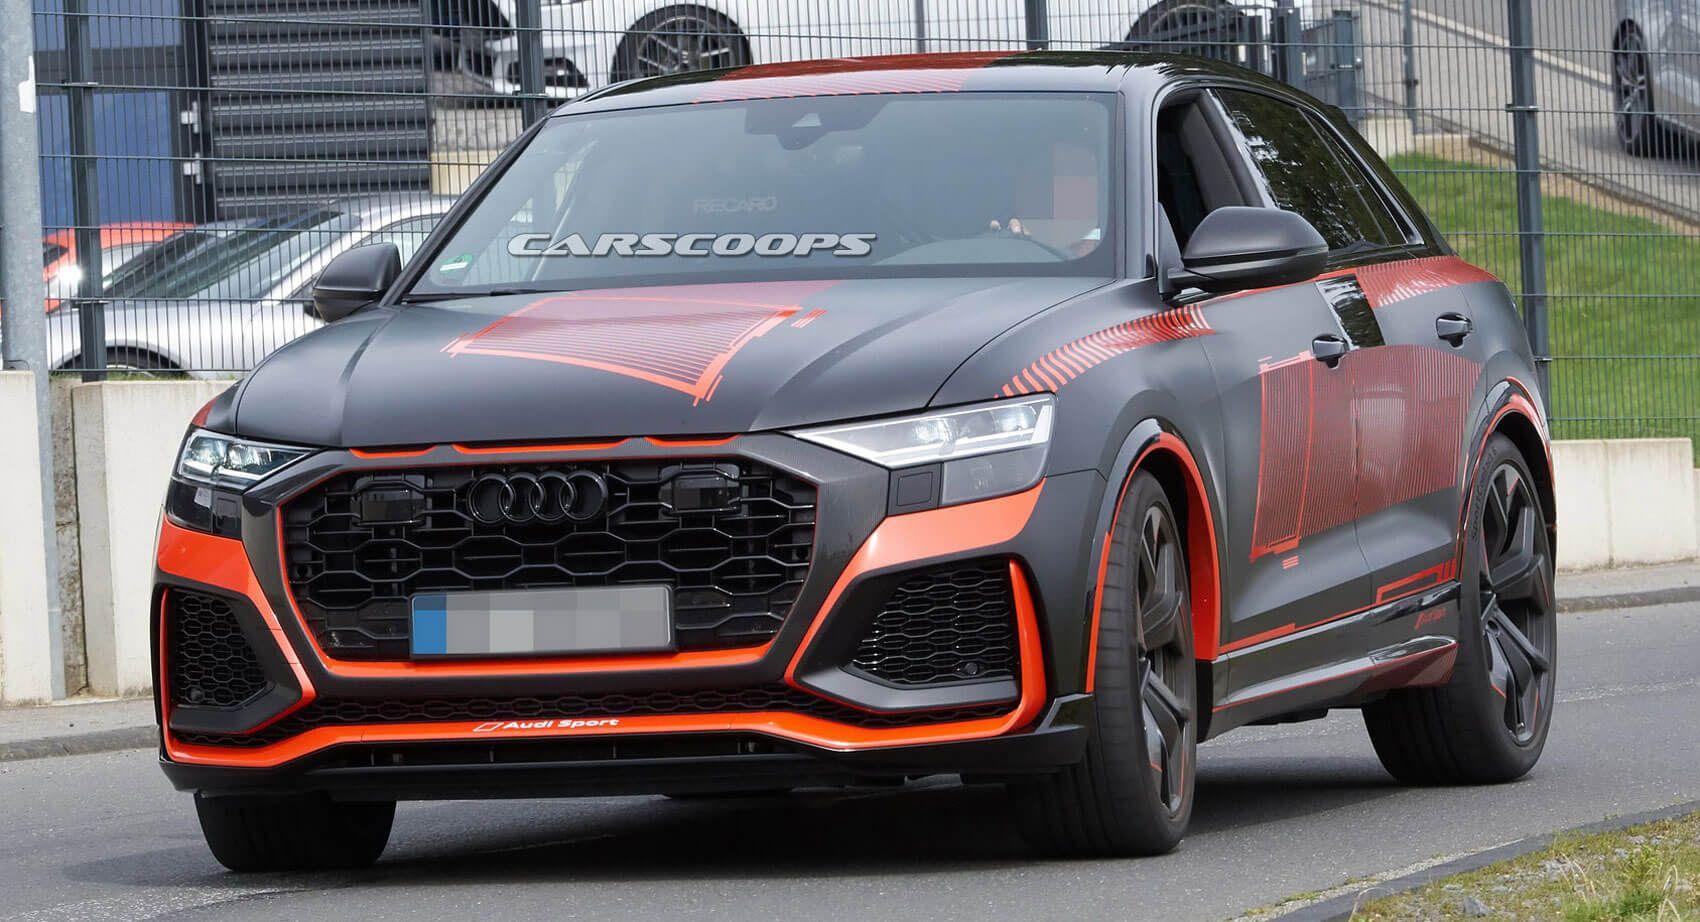 2020 Audi Rs Q8 Soll Am 20 November Starten Audi Audi Rs Bmw X6